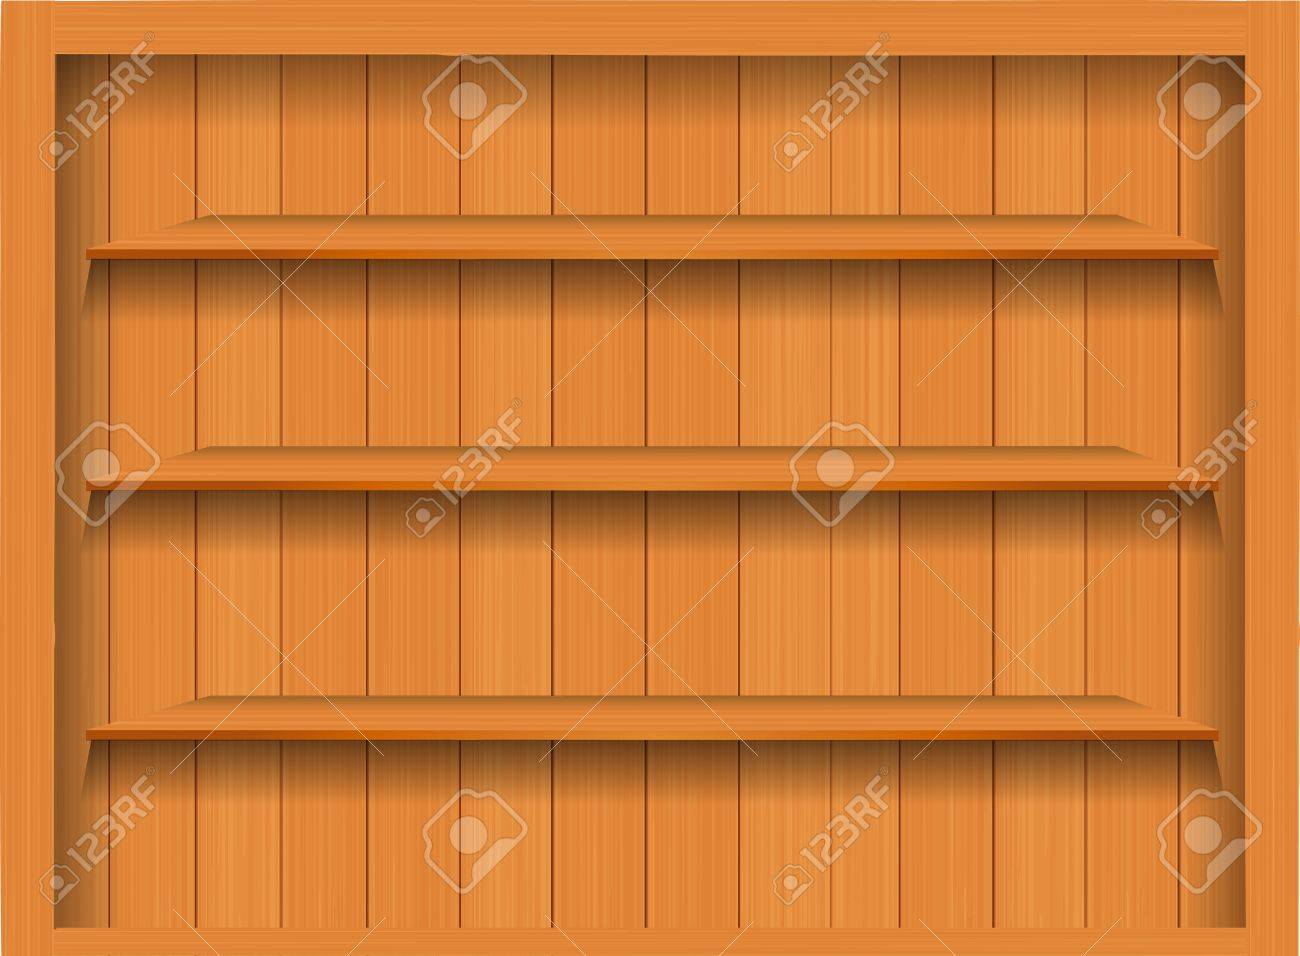 Interior wooden shelves free vector - Vector Empty Wood Shelf Grunge Industrial Interior Uneven Diffuse Lighting Version Design Component Stock